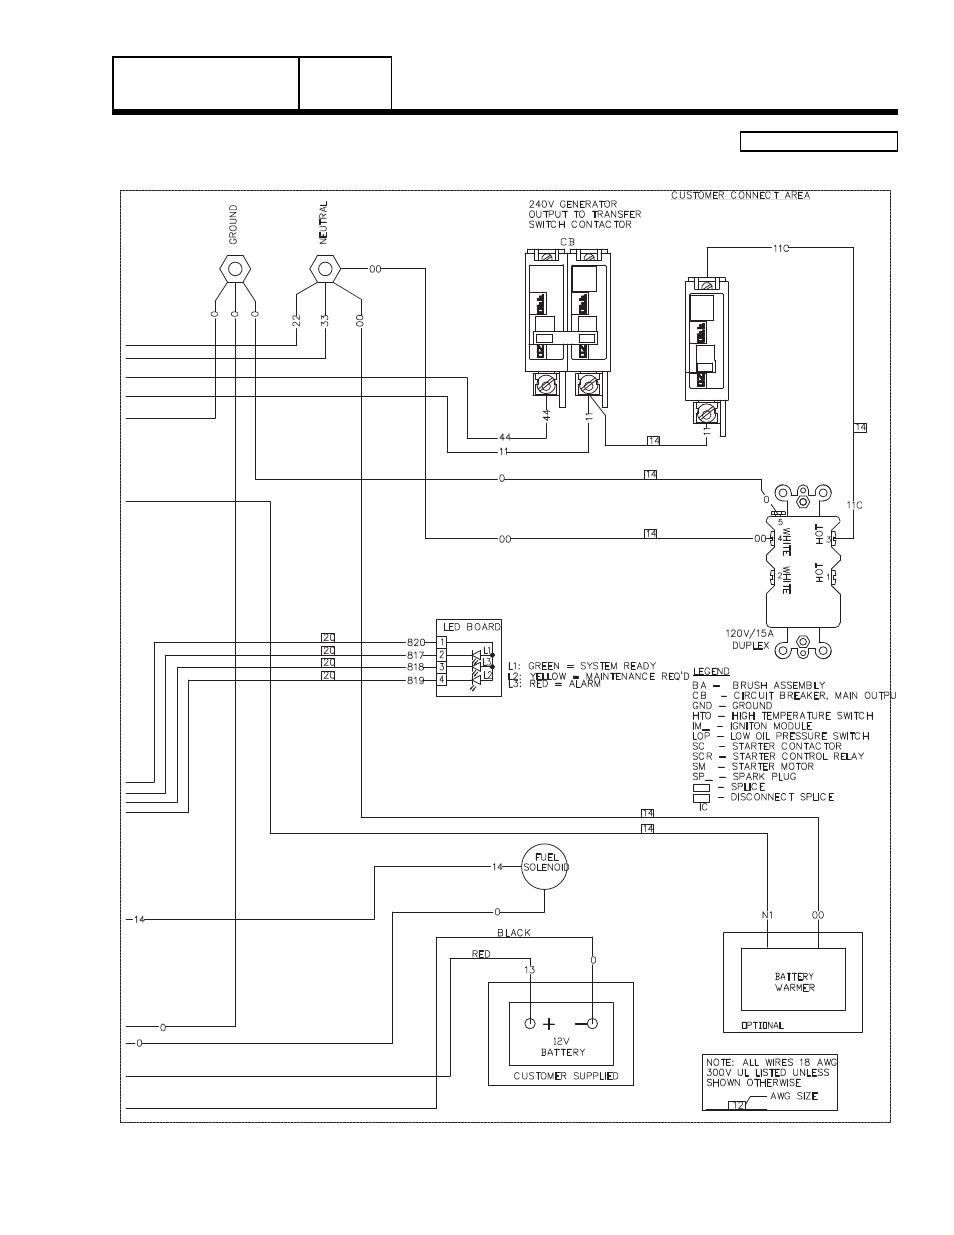 DIAGRAM] Ford Cortina V6 Workshop Wiring Diagram FULL Version HD Quality Wiring  Diagram - CORONADELVISTA.DATAJOB2013.FRcoronadelvista.datajob2013.fr